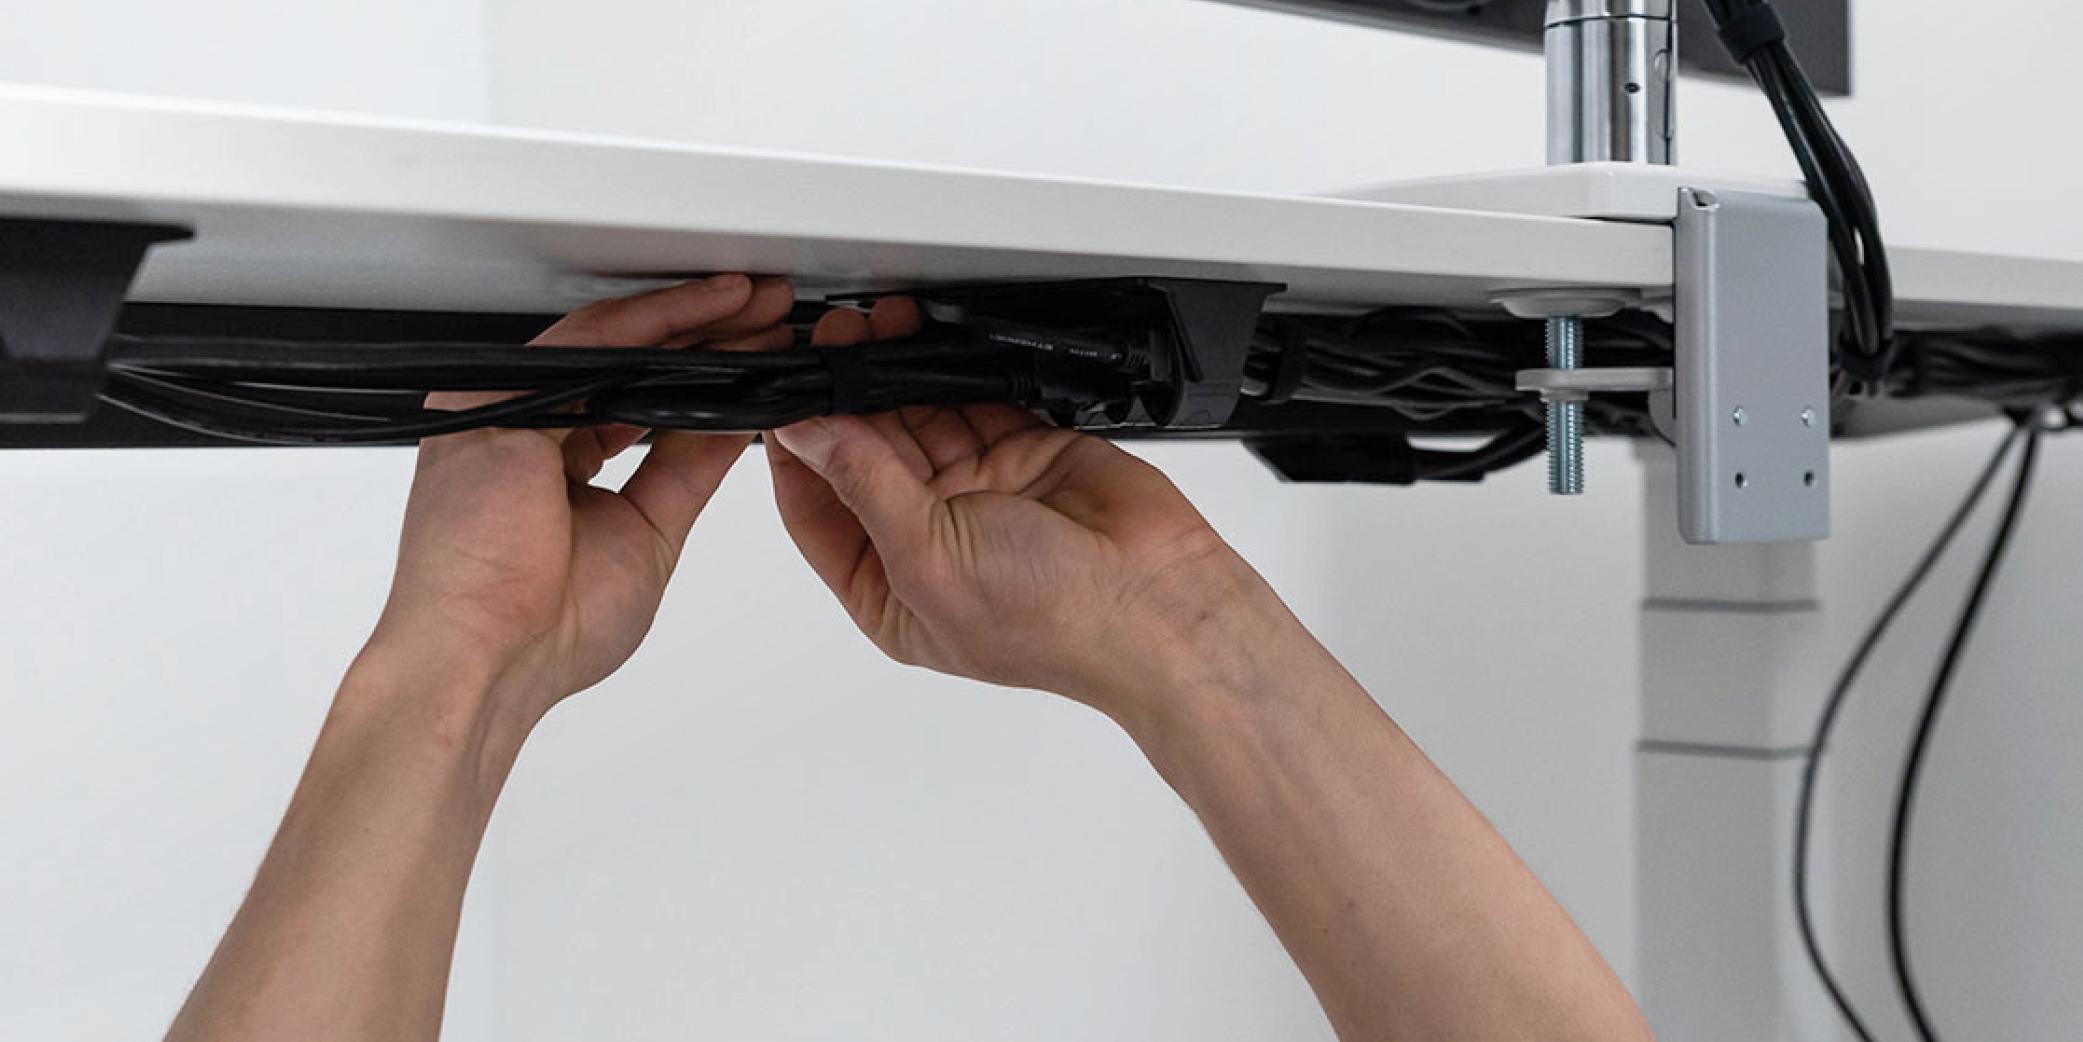 Kabelgeleiding - kabelmanagement -kabels onder bureau wegwerken - cable grips